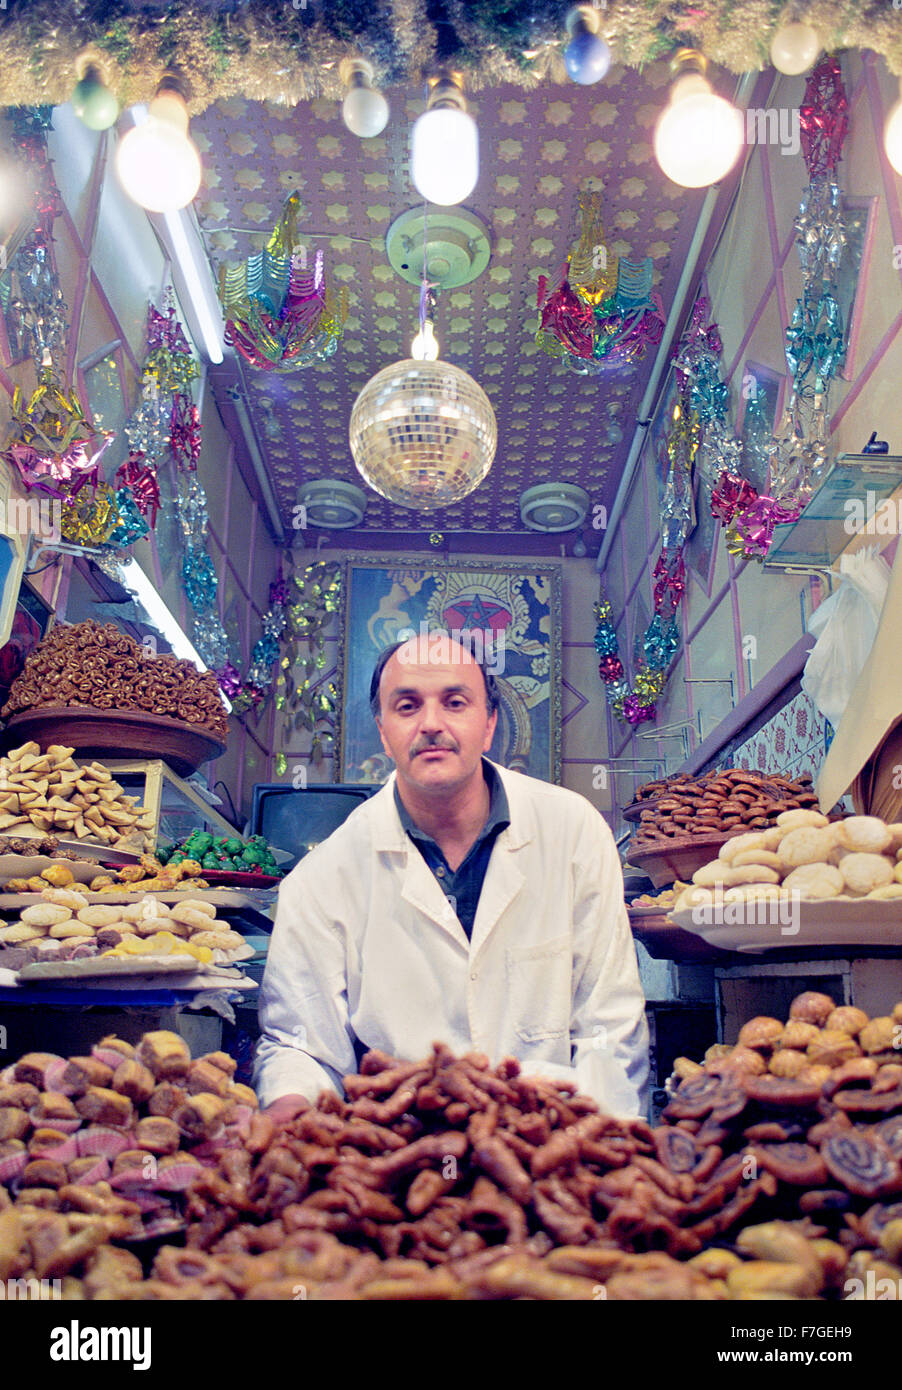 Ein Gebäck Garküche in der Medina in Marrakesch. Marokko Stockbild